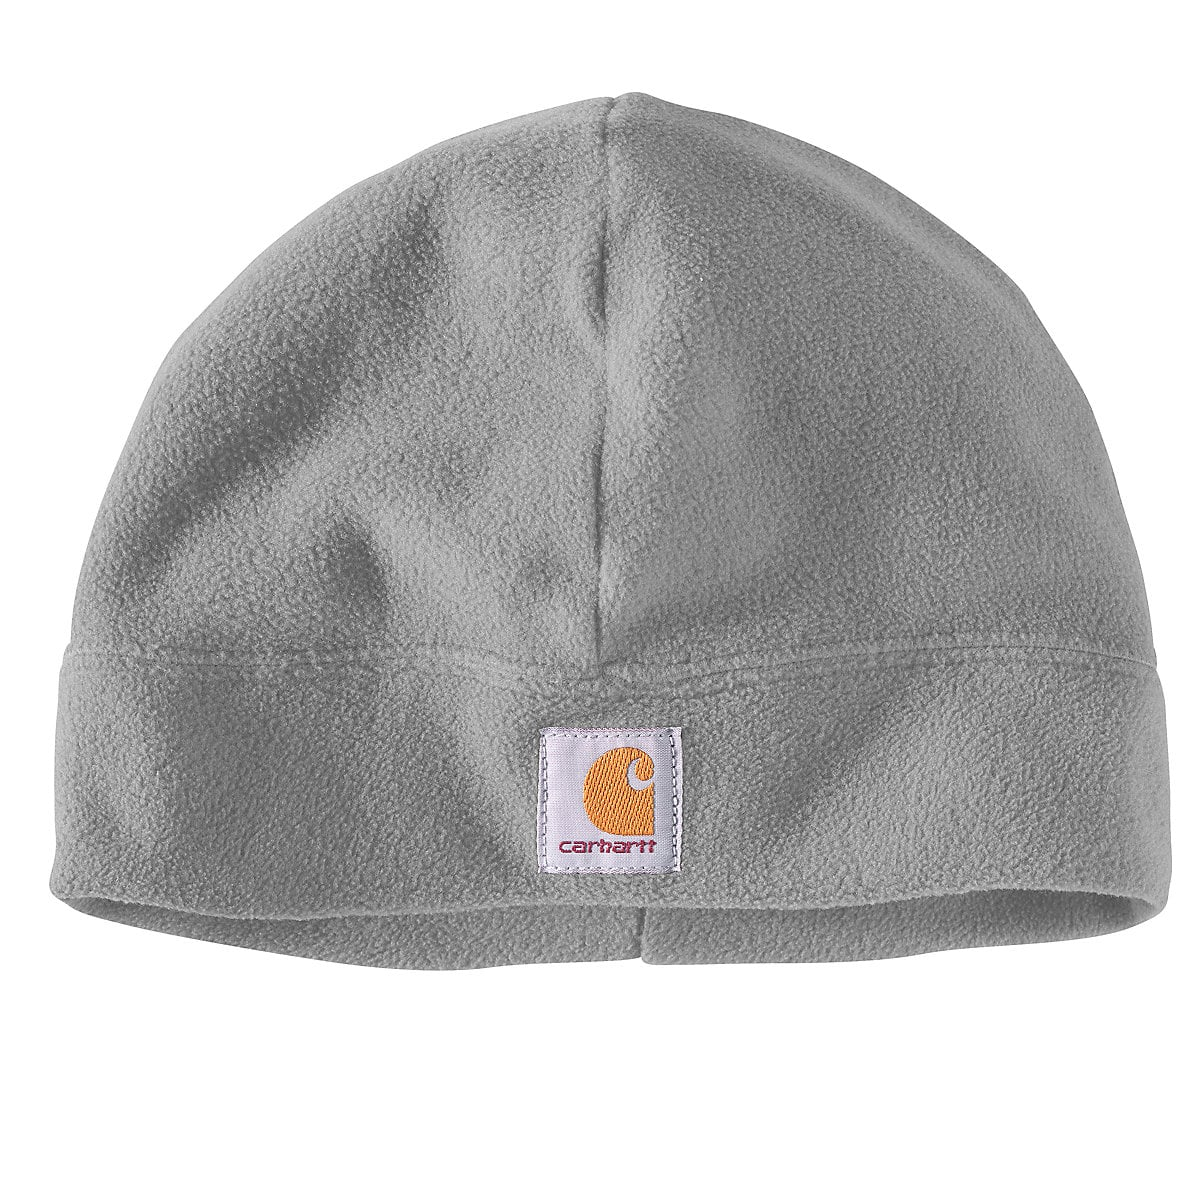 17f97bc075cd7 Men s Fleece Hat A207